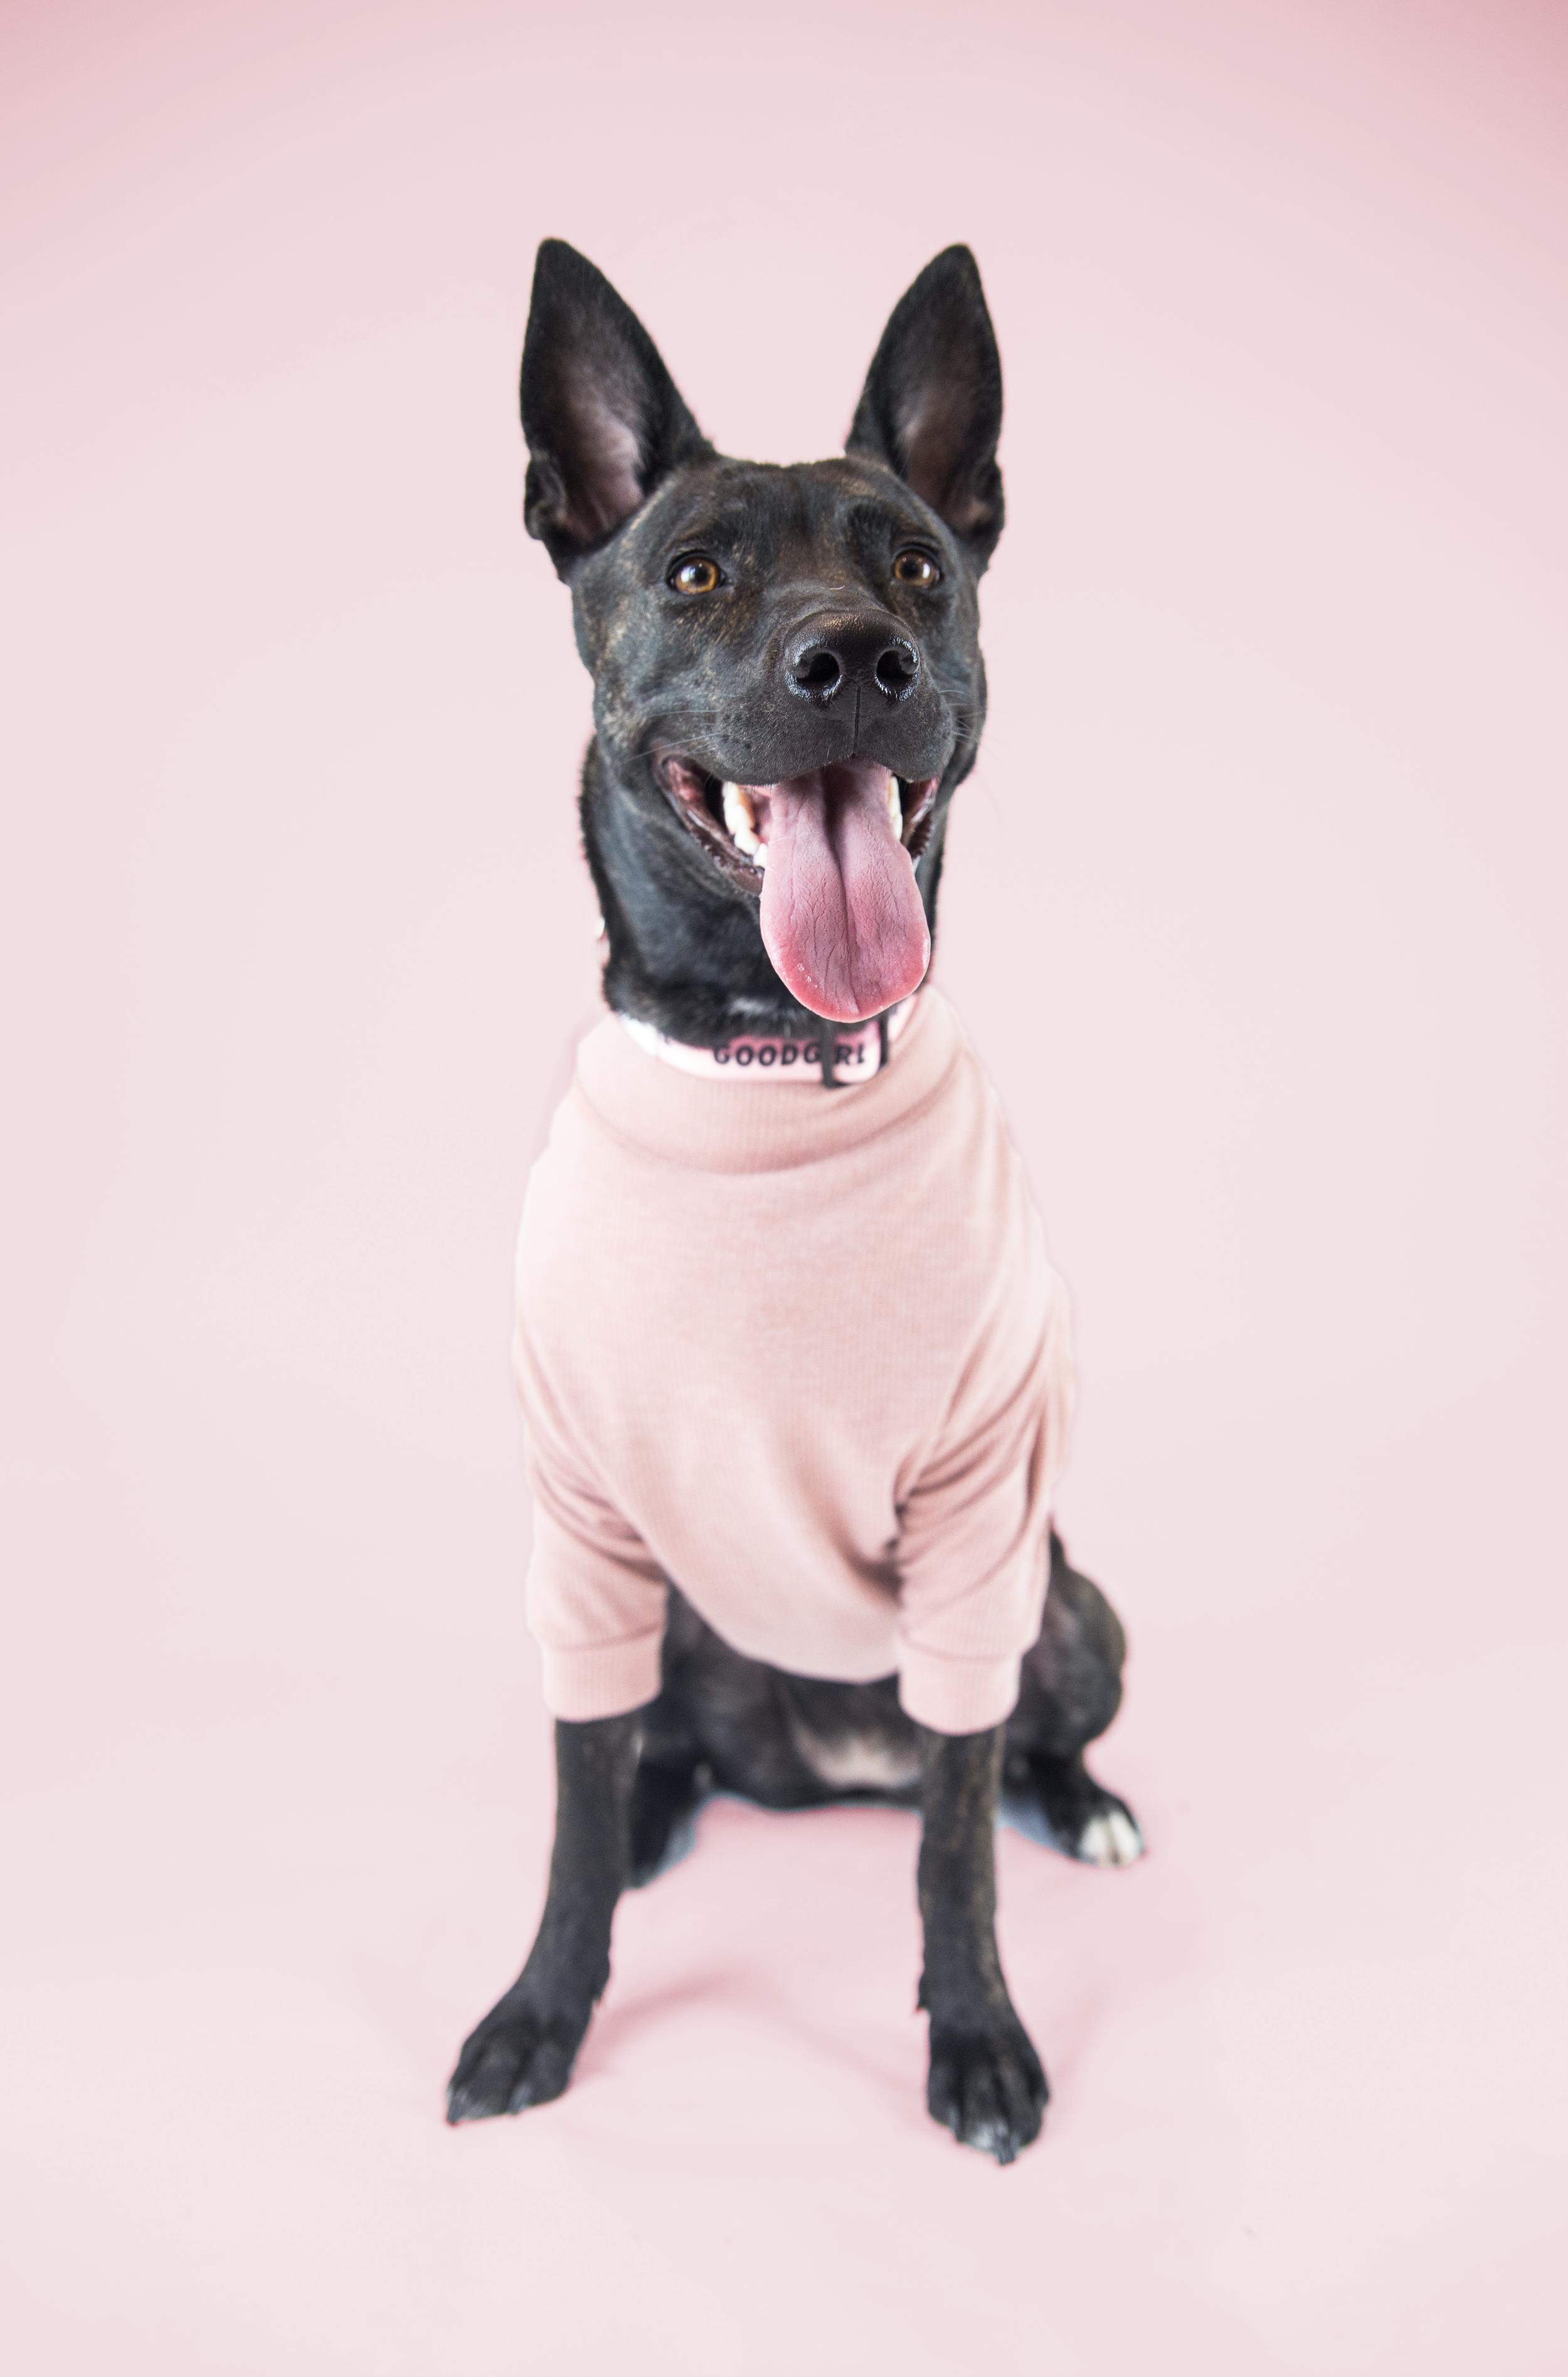 Meet Satoshi. - Age: 15 monthsBreed: Staffy, German Shepherd, Siberian Husky MixHometown: Caledon, Ontario